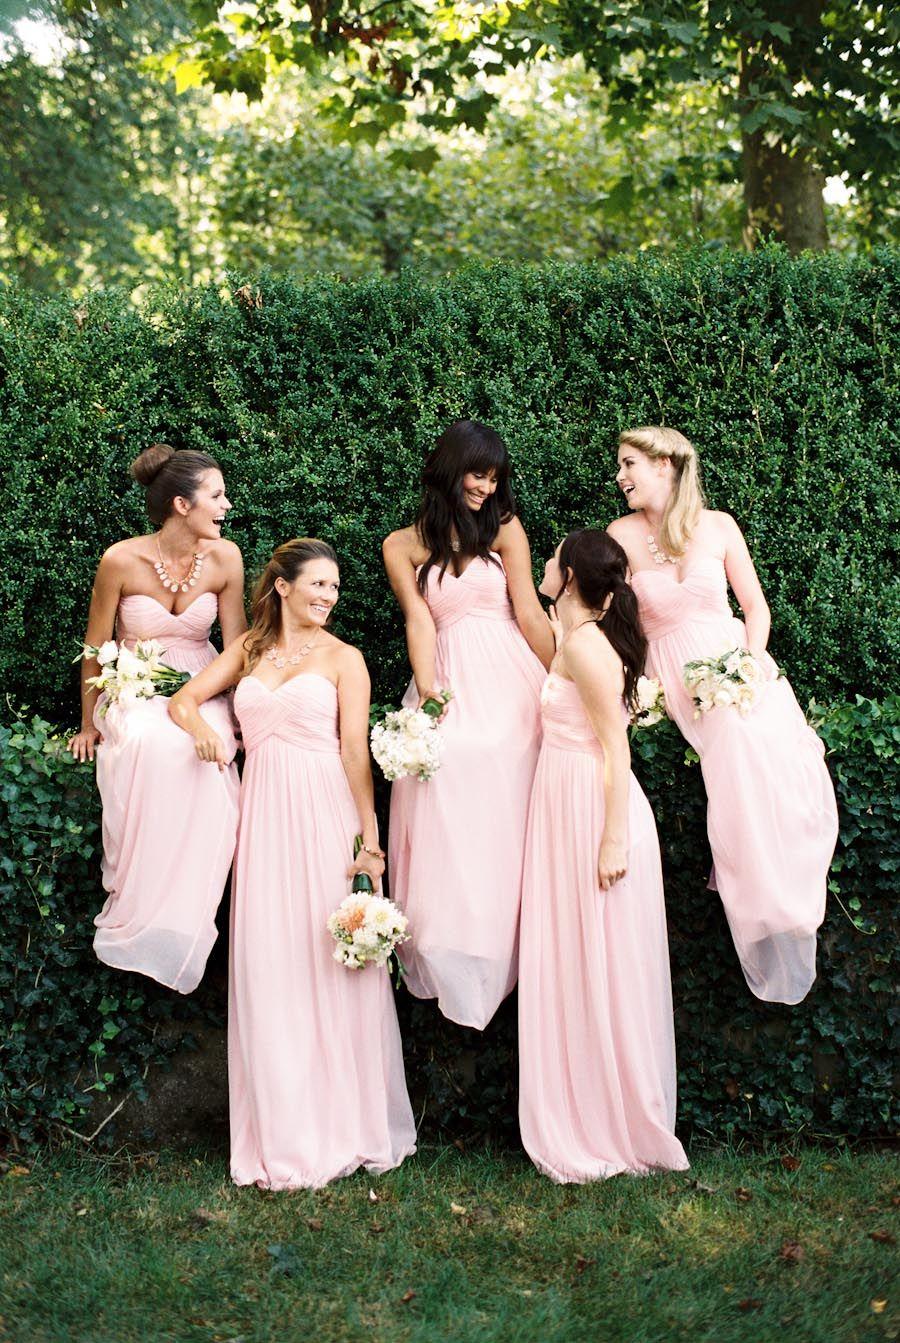 Donna morgan bridesmaids spring campaign photography by